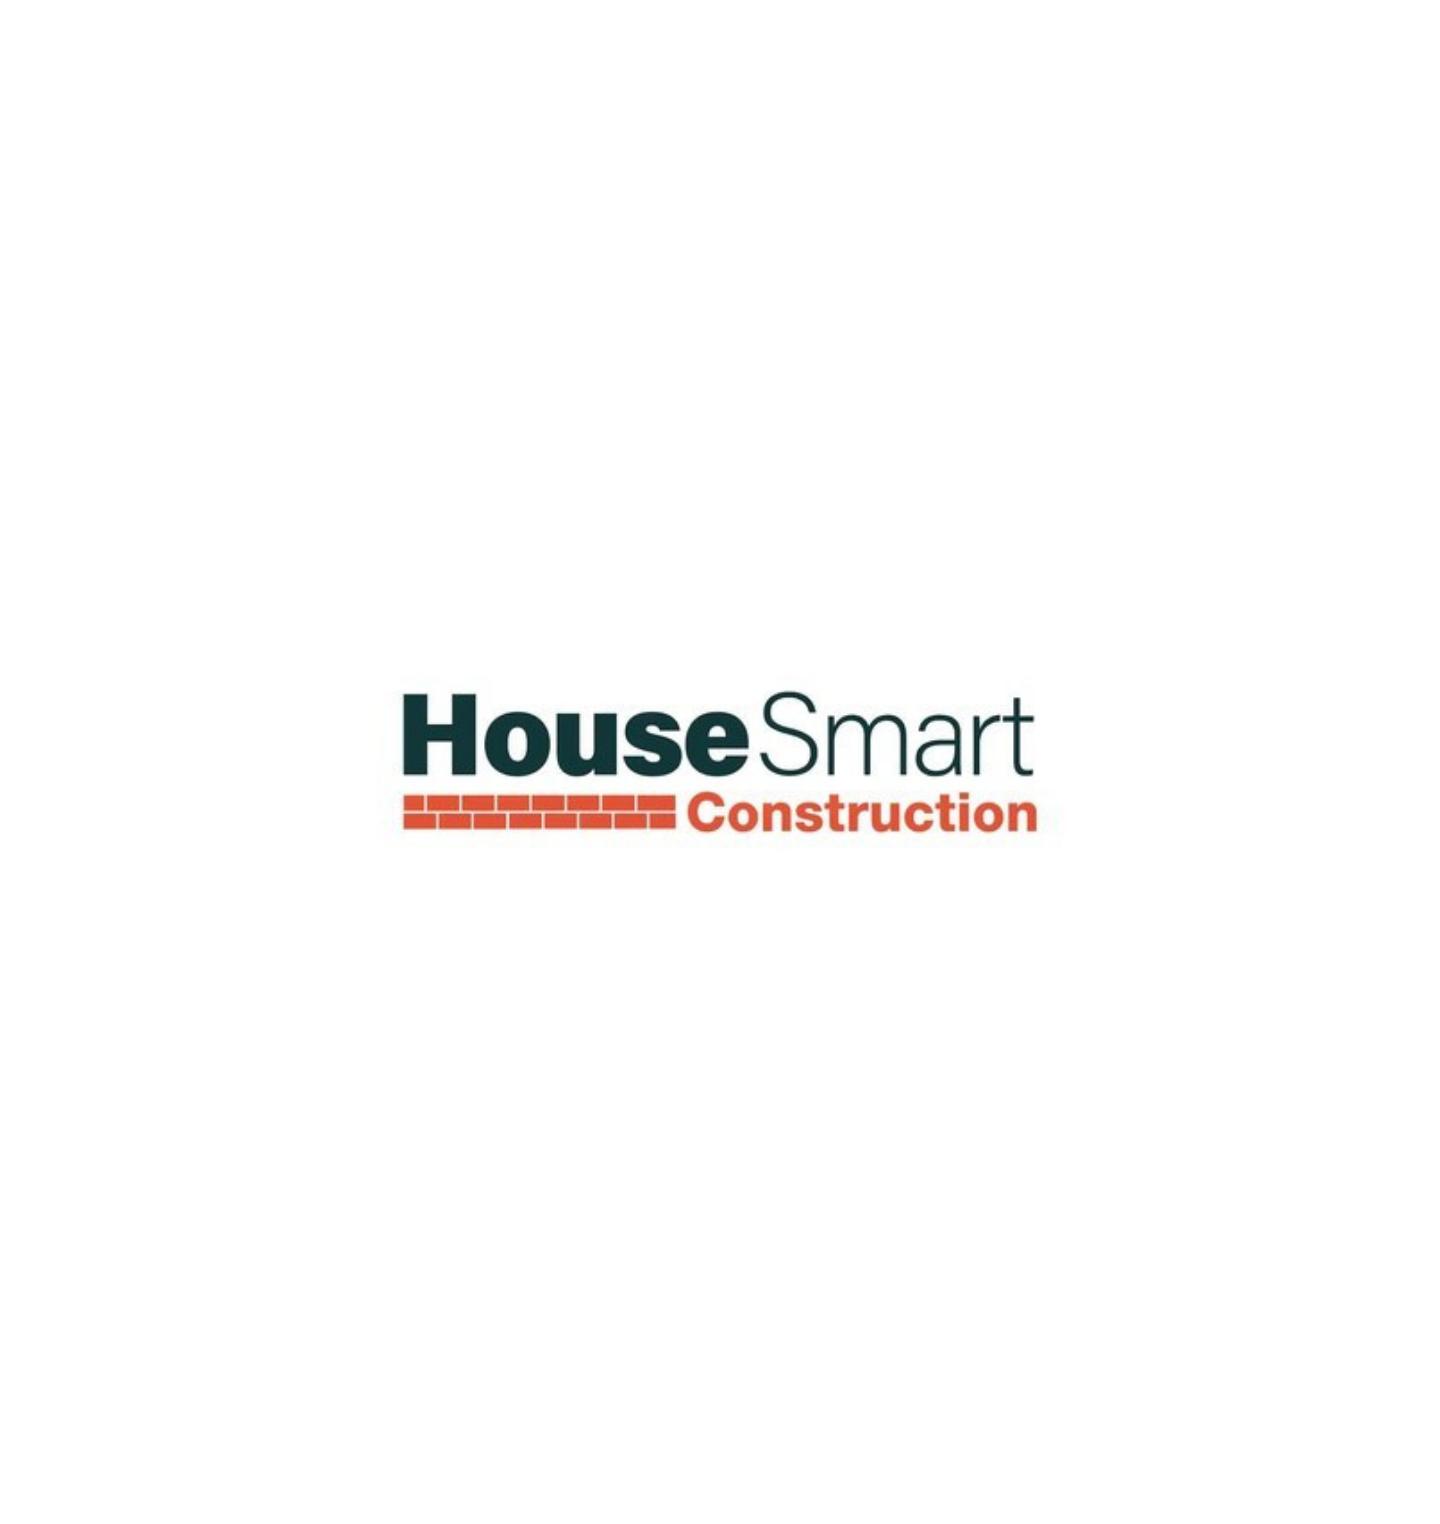 housesmart construction